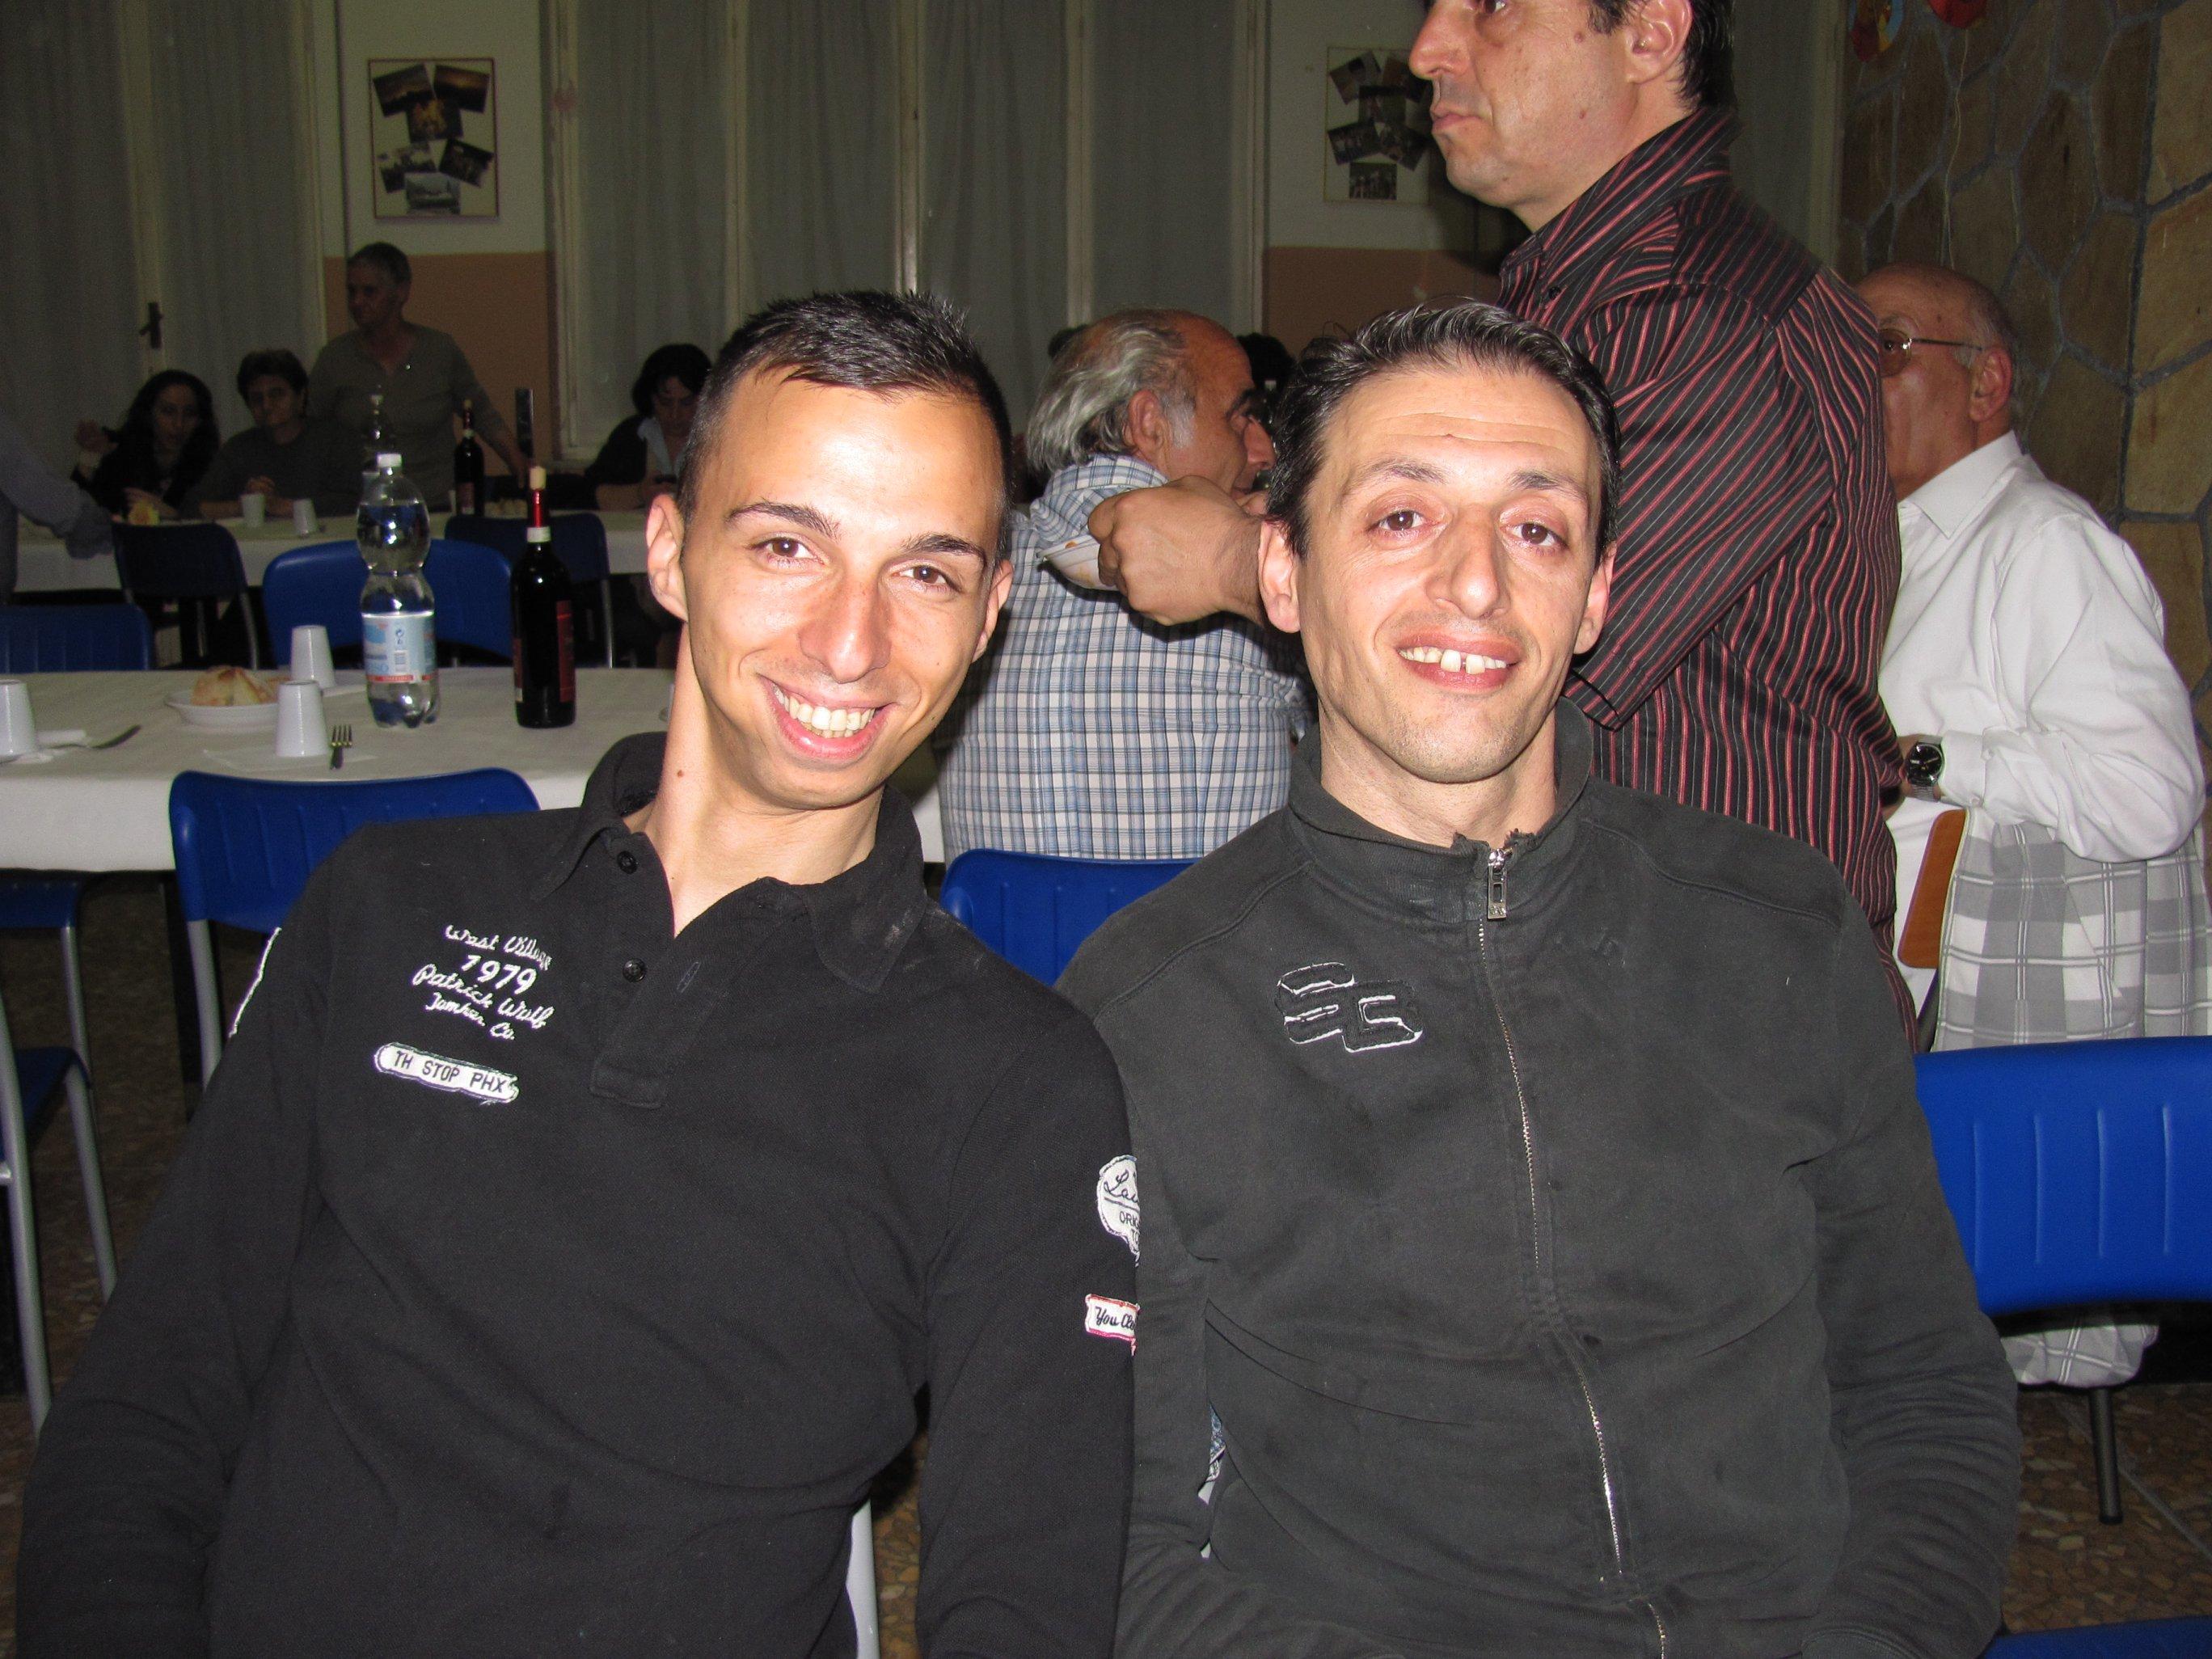 festa_madonna_2012-05-27-21-47-57